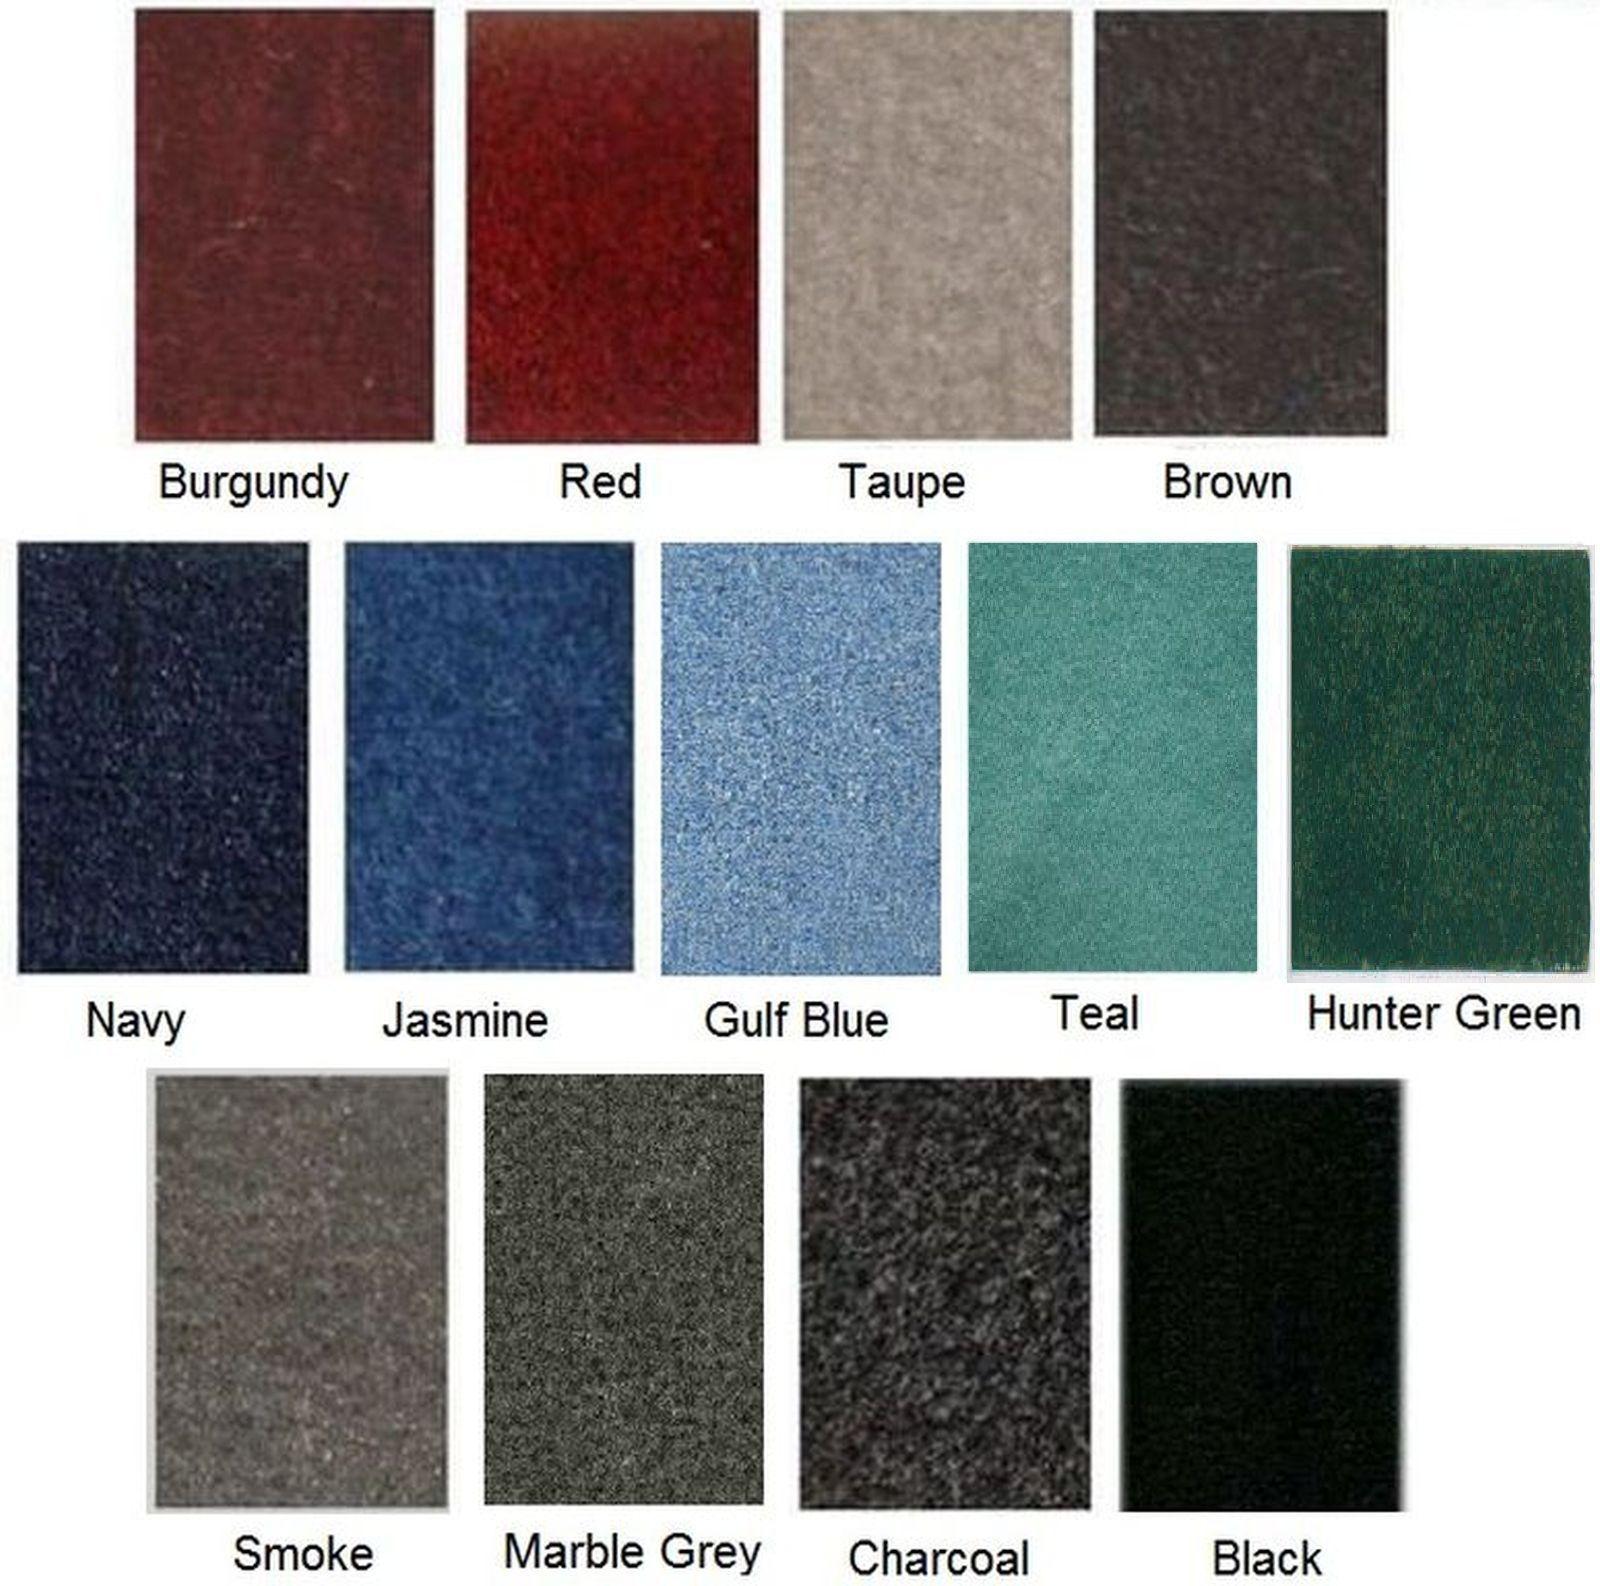 Get a unique look with Marine carpet